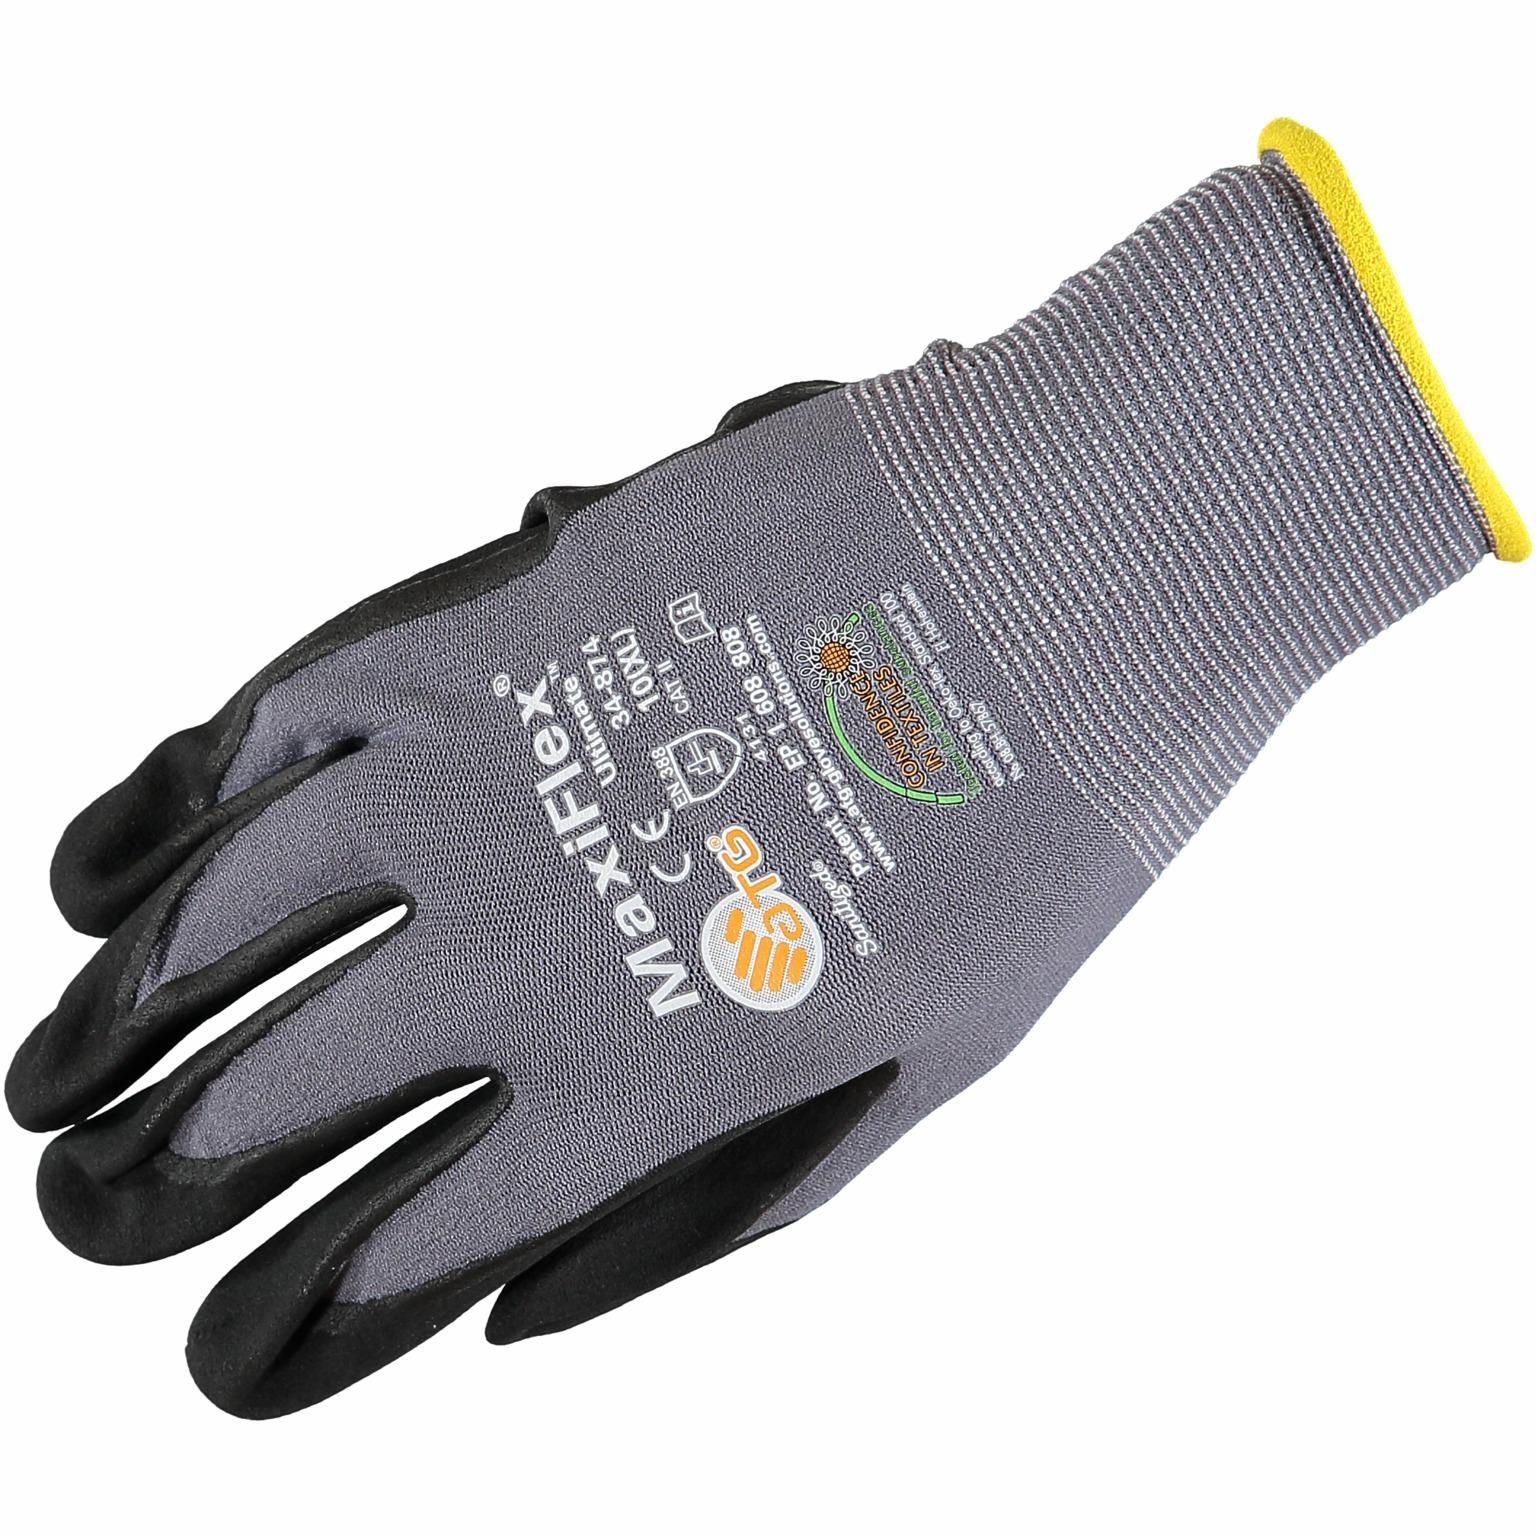 Avanceret HANDSKE MAXIFLEX ULTIMATE | Beijer Byggmaterial PM62